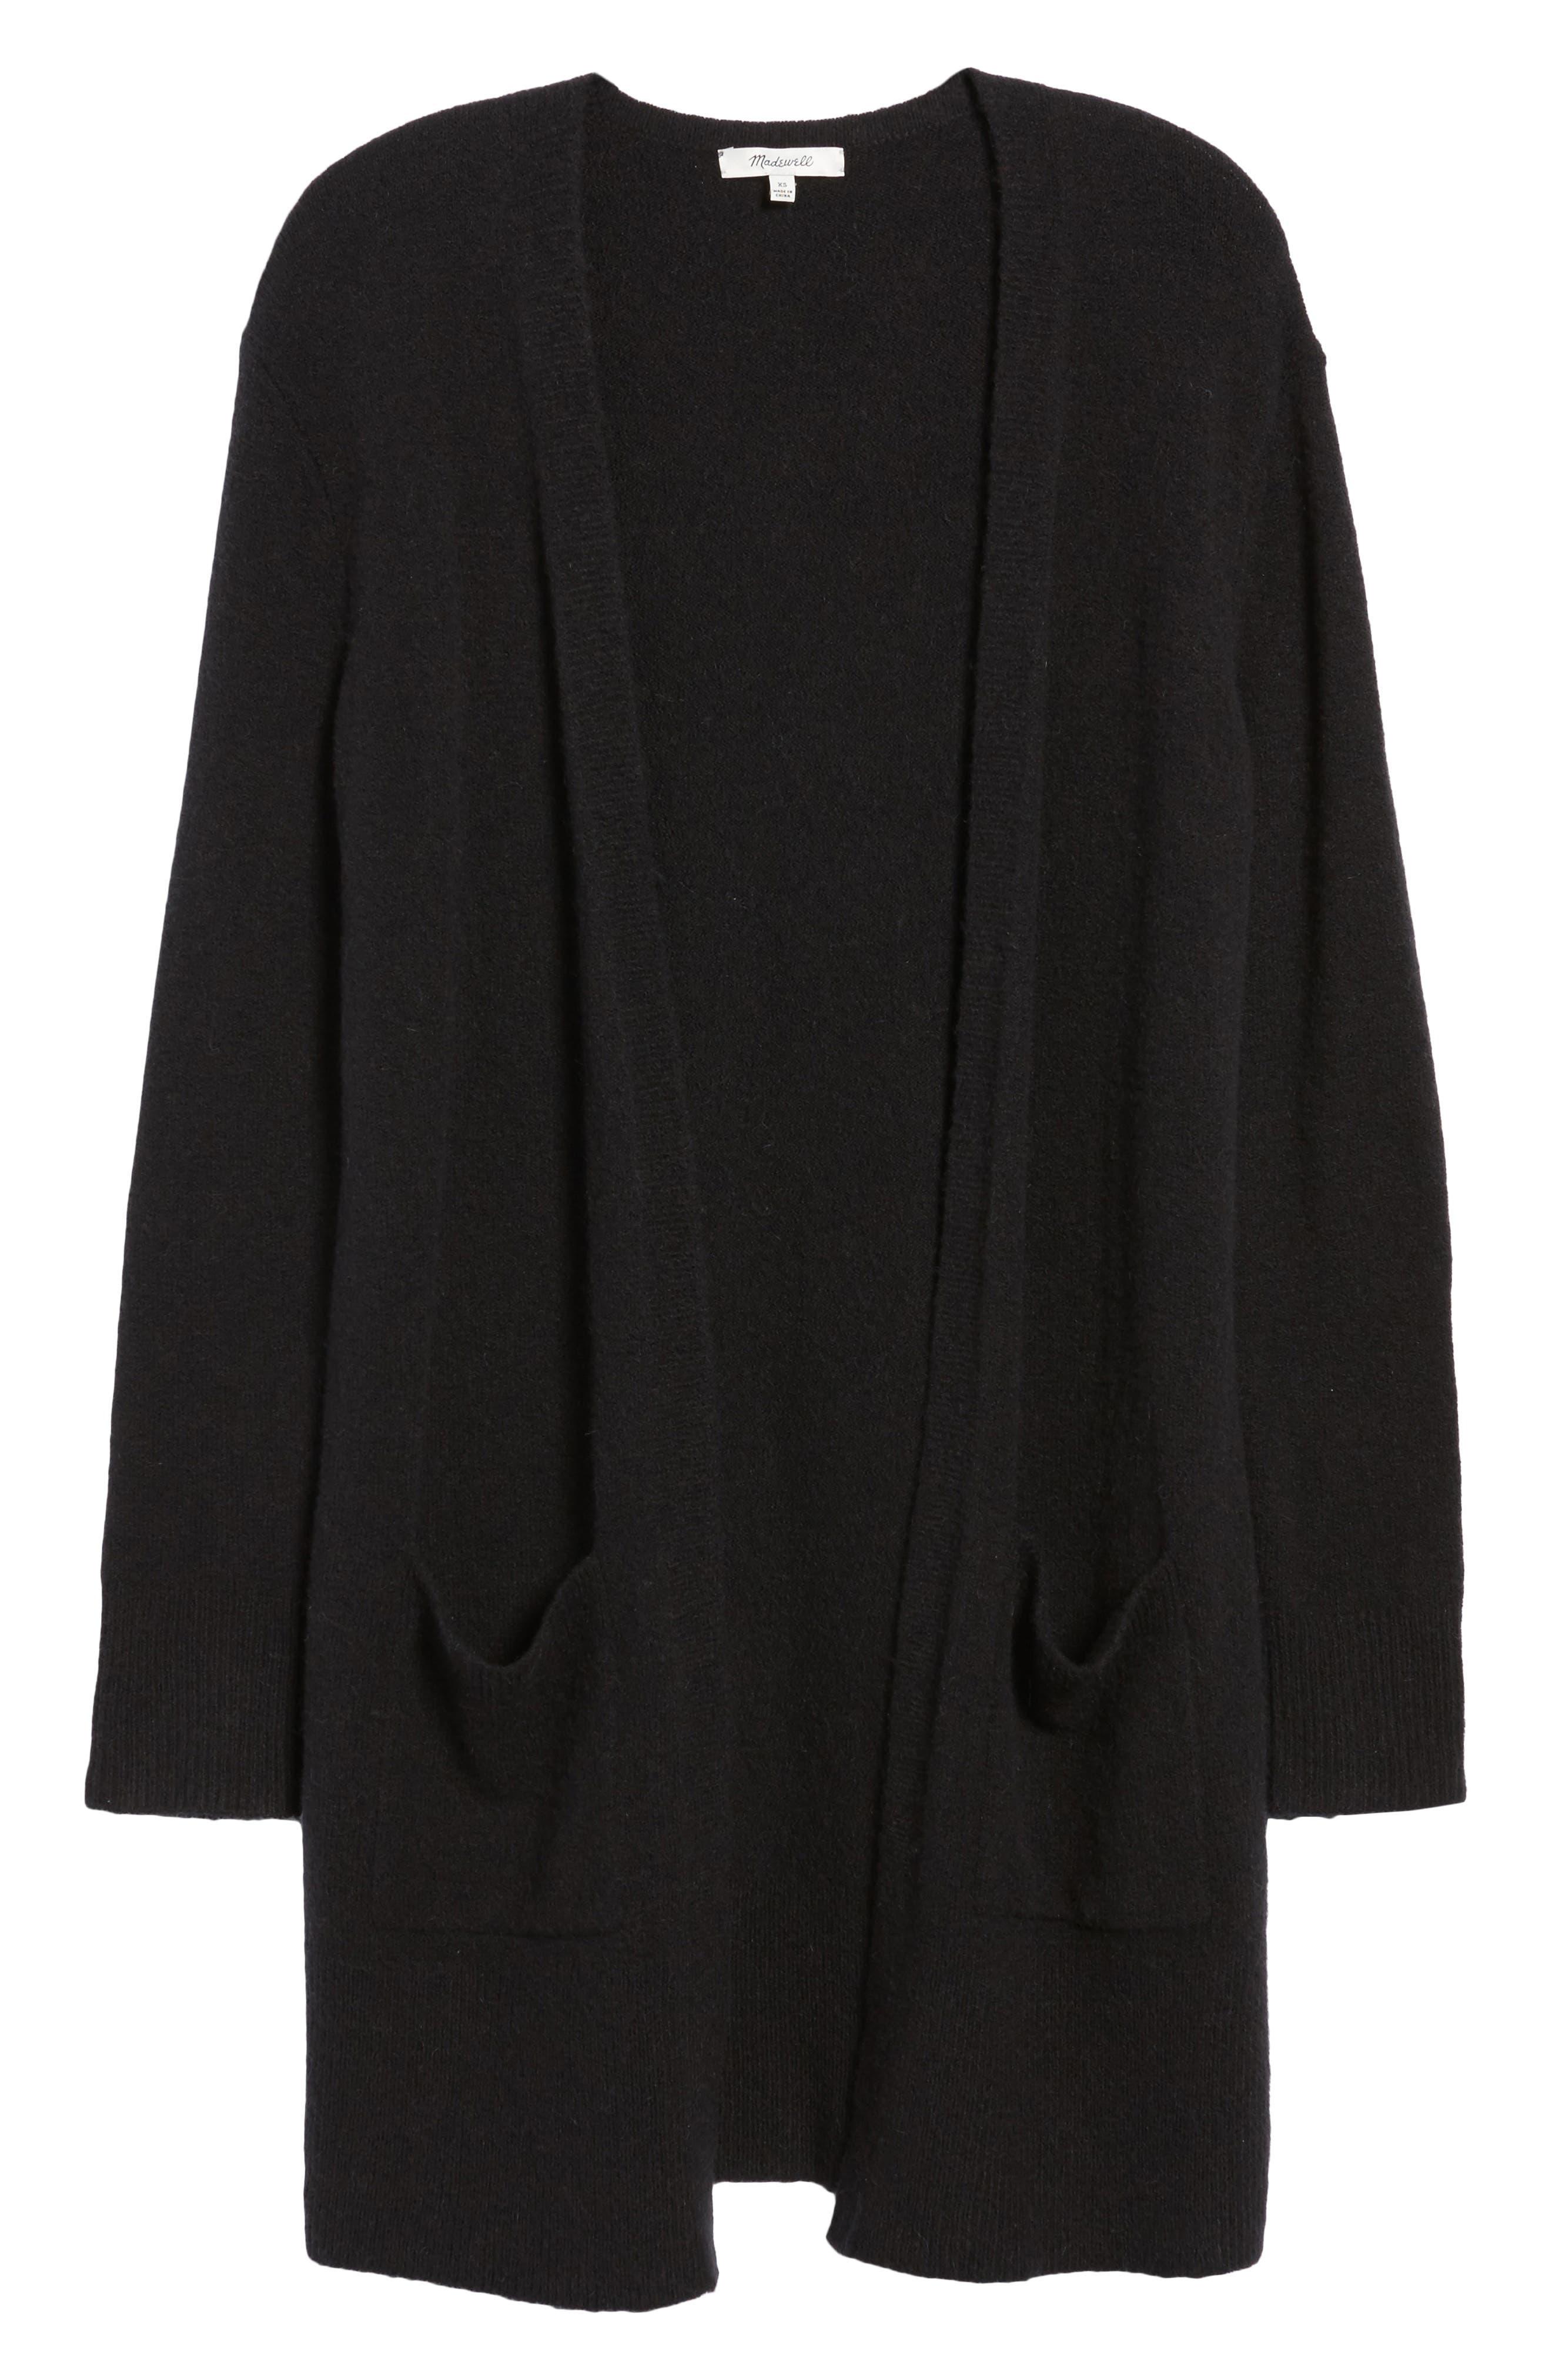 MADEWELL, Kent Cardigan Sweater, Alternate thumbnail 6, color, TRUE BLACK